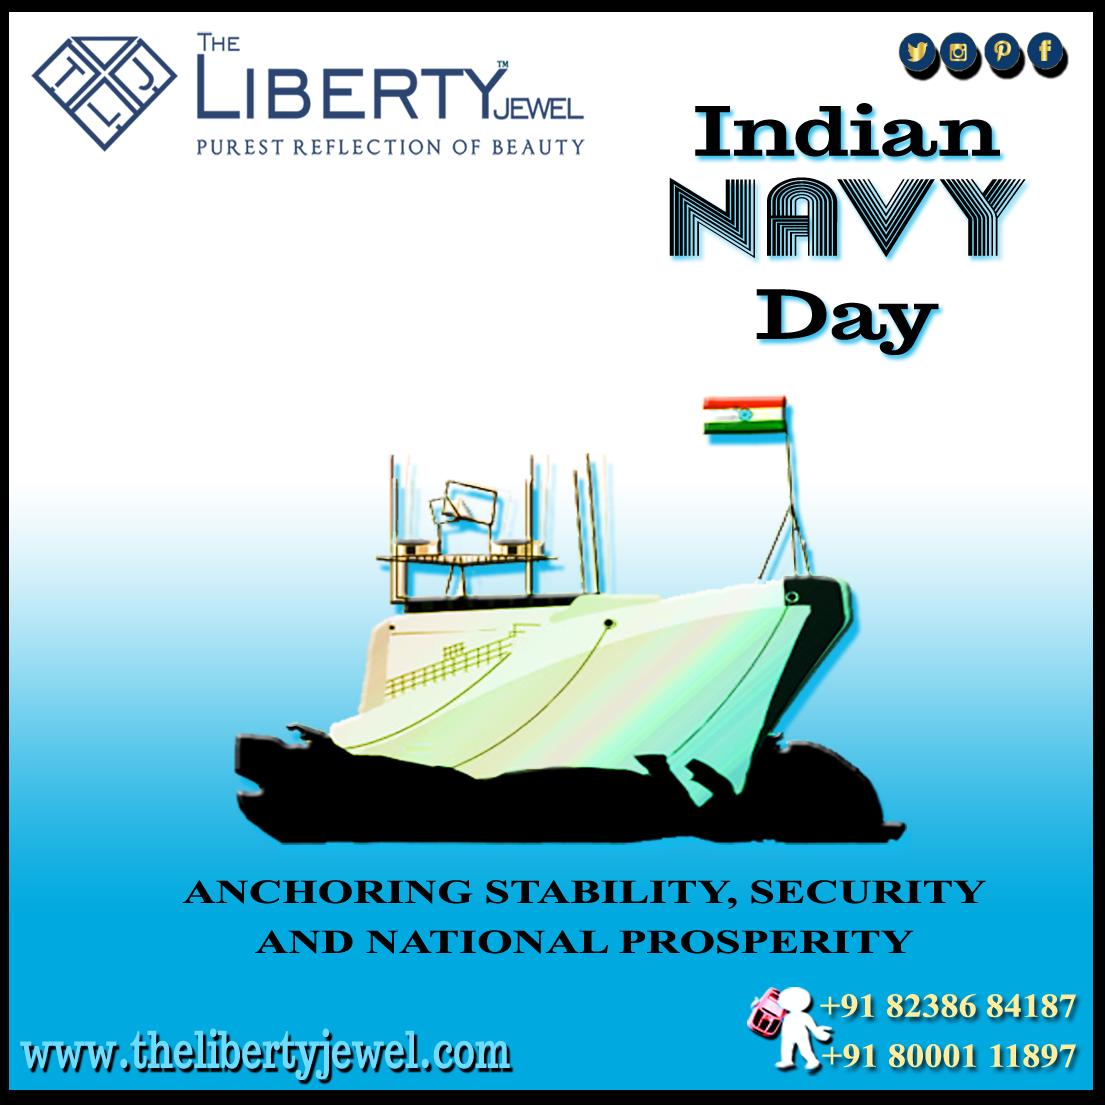 Indian Navy Day Indian Navy Day Navy Day Large Jewelry